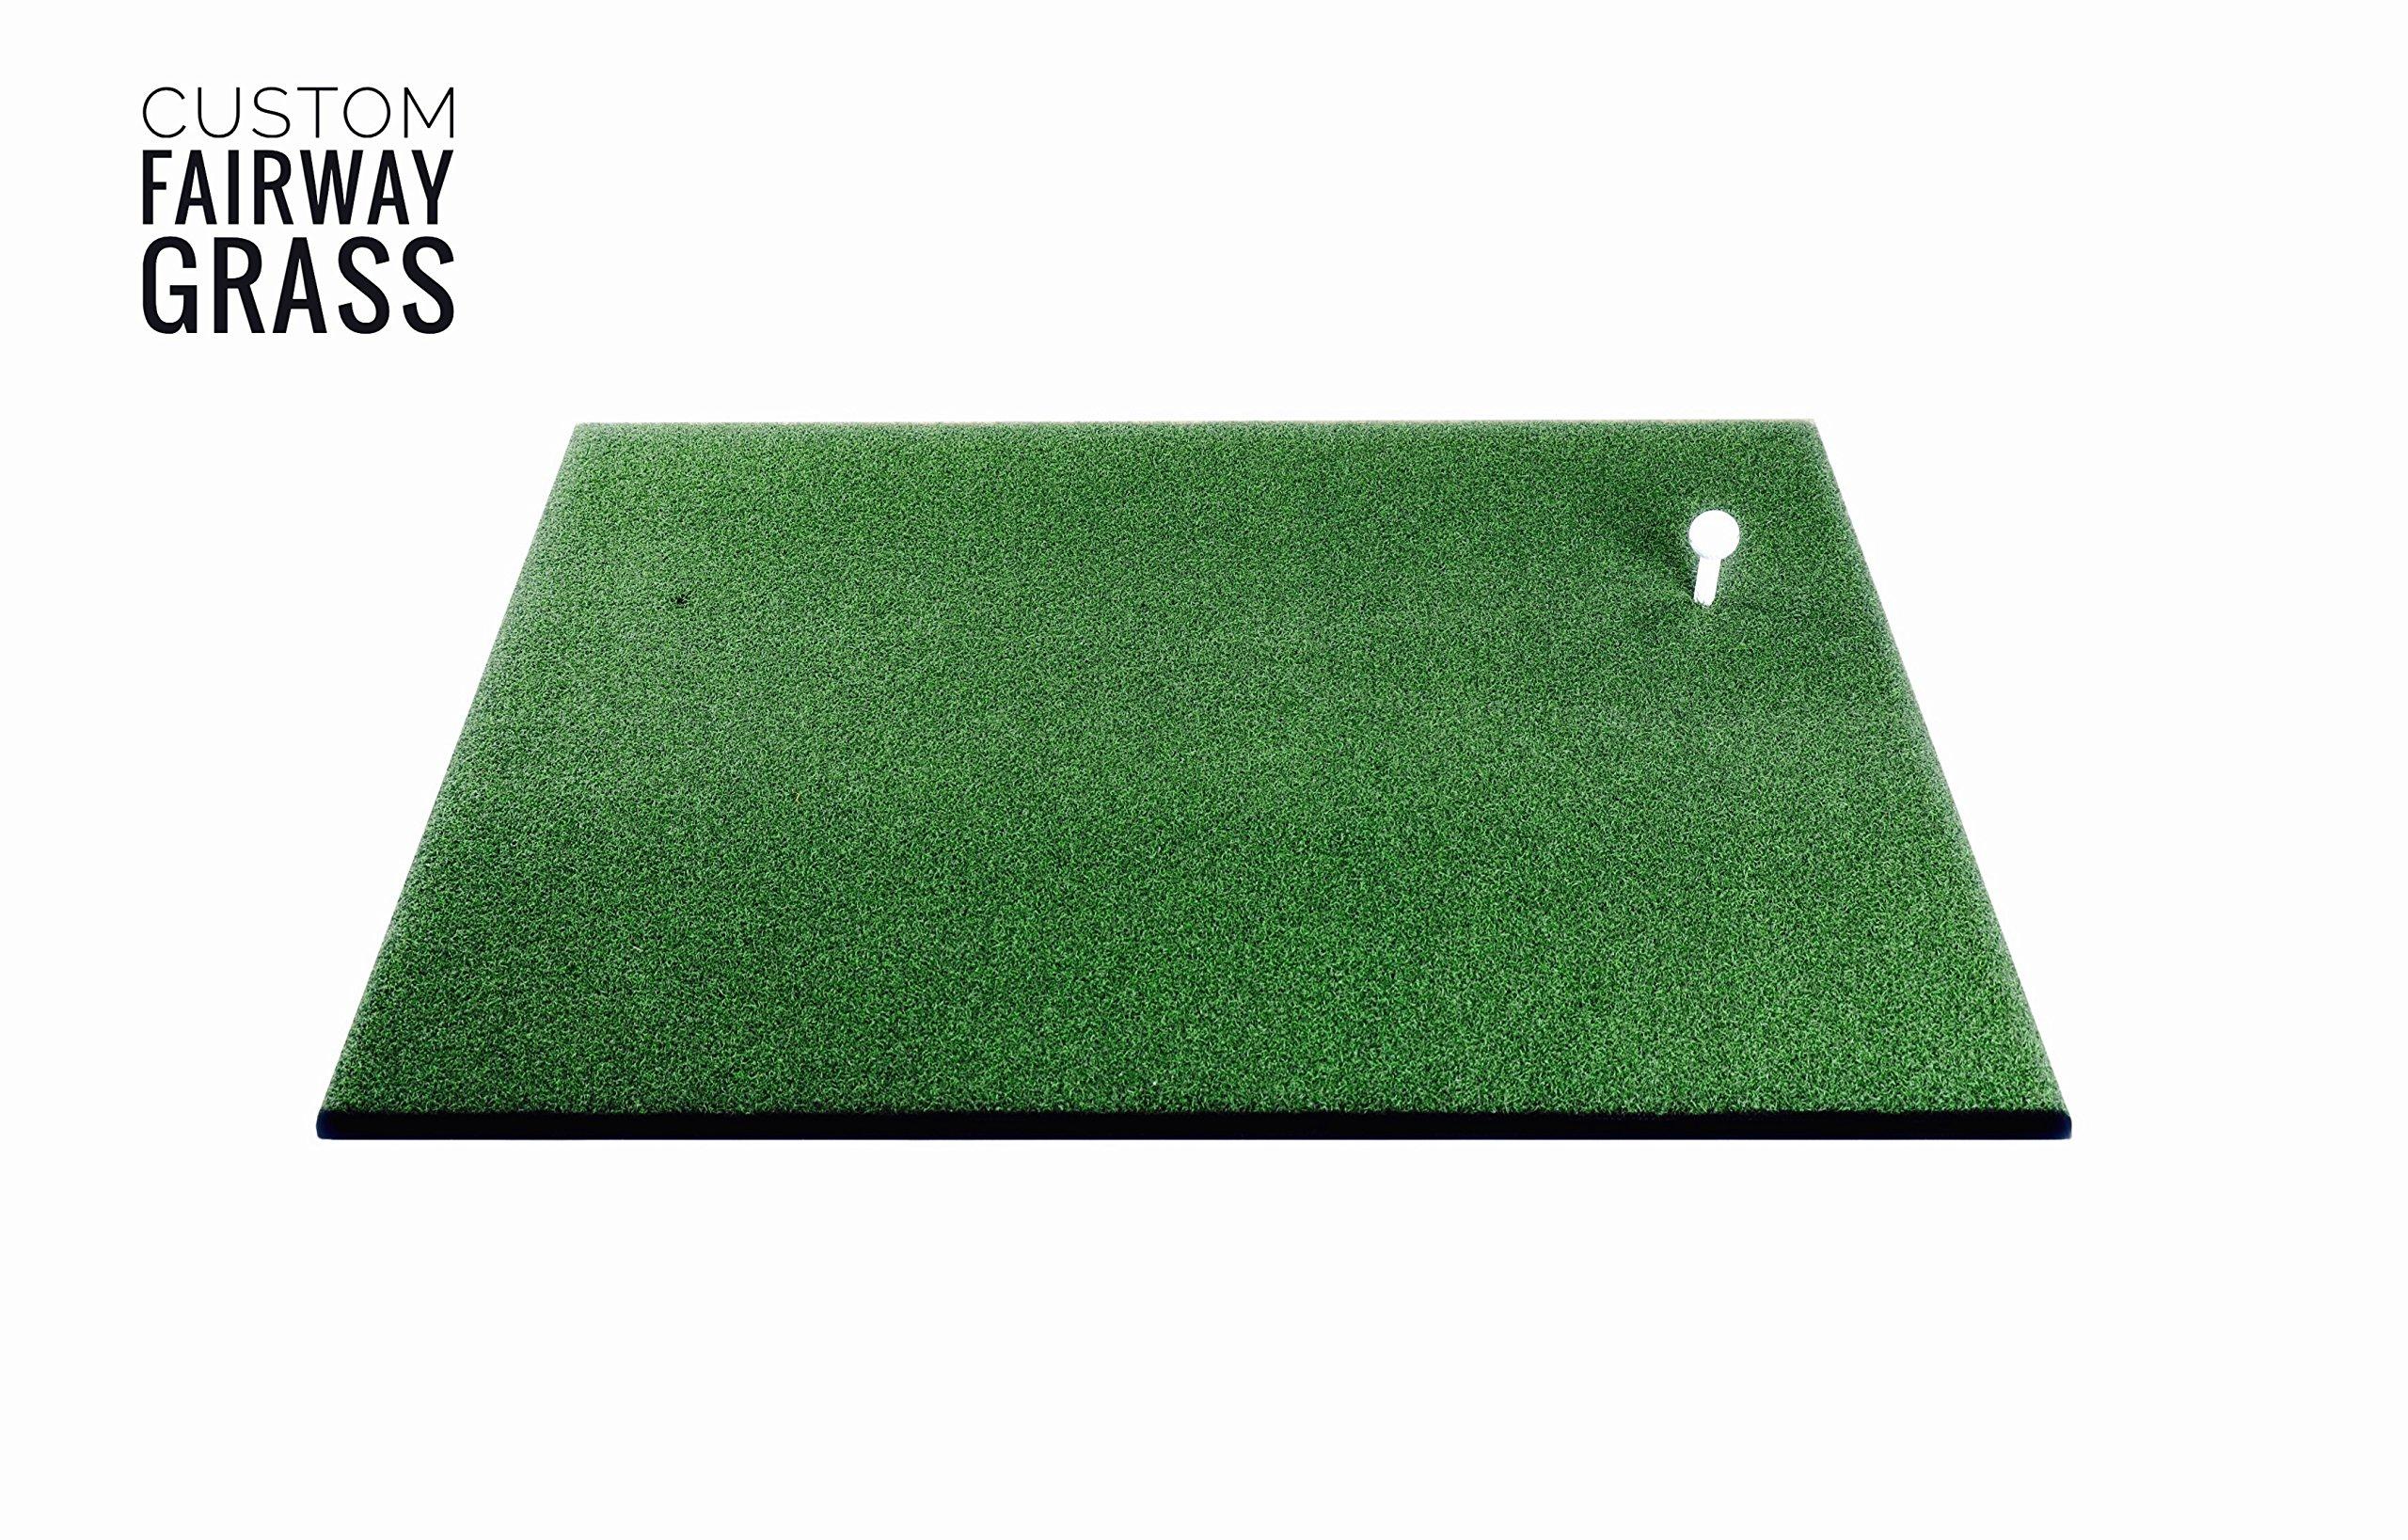 Fairway One Golf Hitting Mat (48in x 36in) by Motivo Golf by Motivo Golf (Image #5)